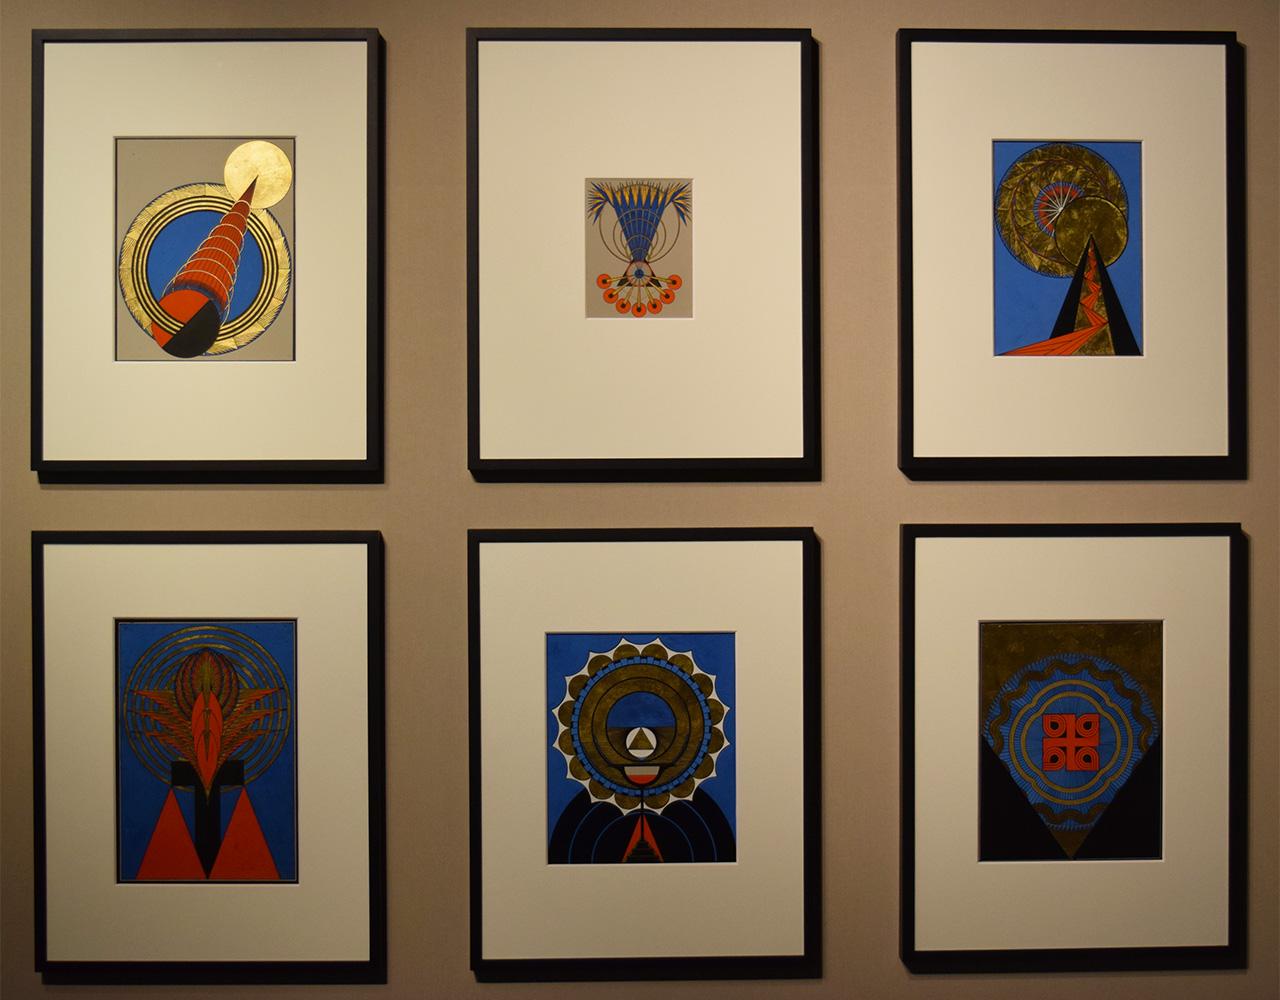 Works by Olga Fröbe-Kapteyn